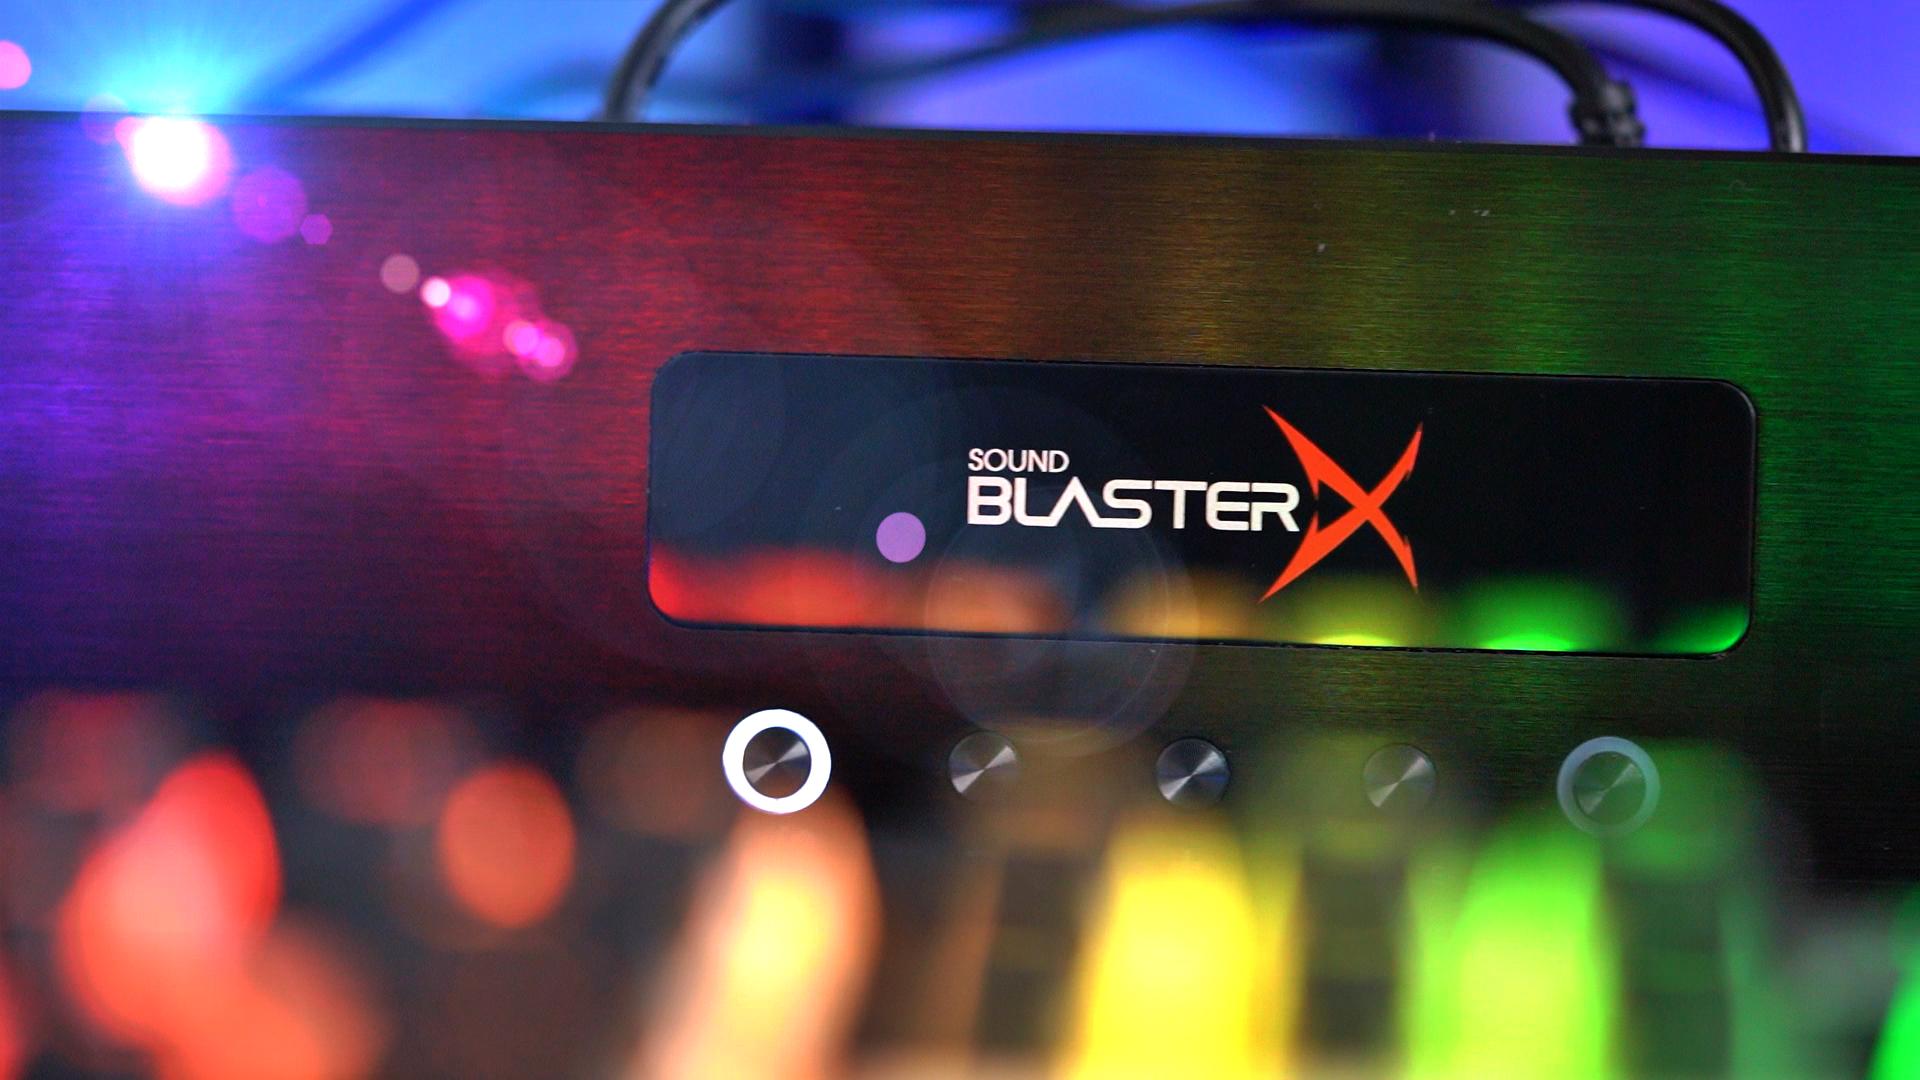 Creative Sound Blaster X Katana - najlepszy soundbar do grania! 19 Creative Sound Blaster X Katana